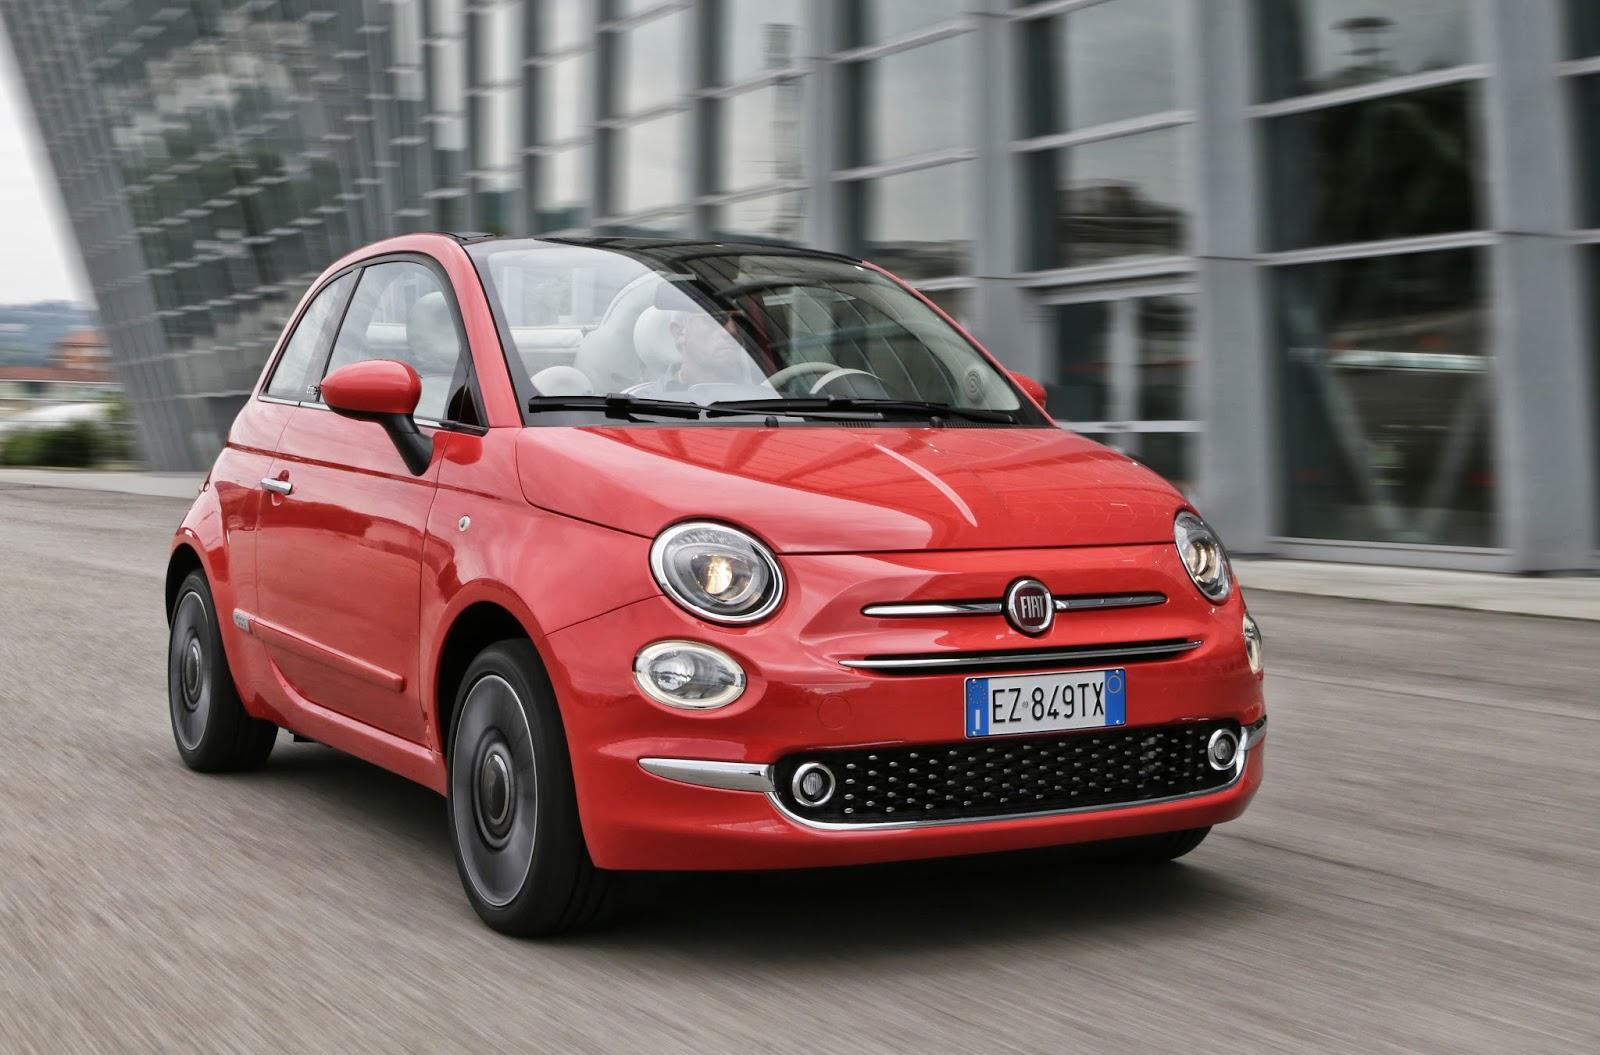 150703 FIAT Nuova 500 28 Η άφιξη του νέου Fiat 500 είναι γεγονός